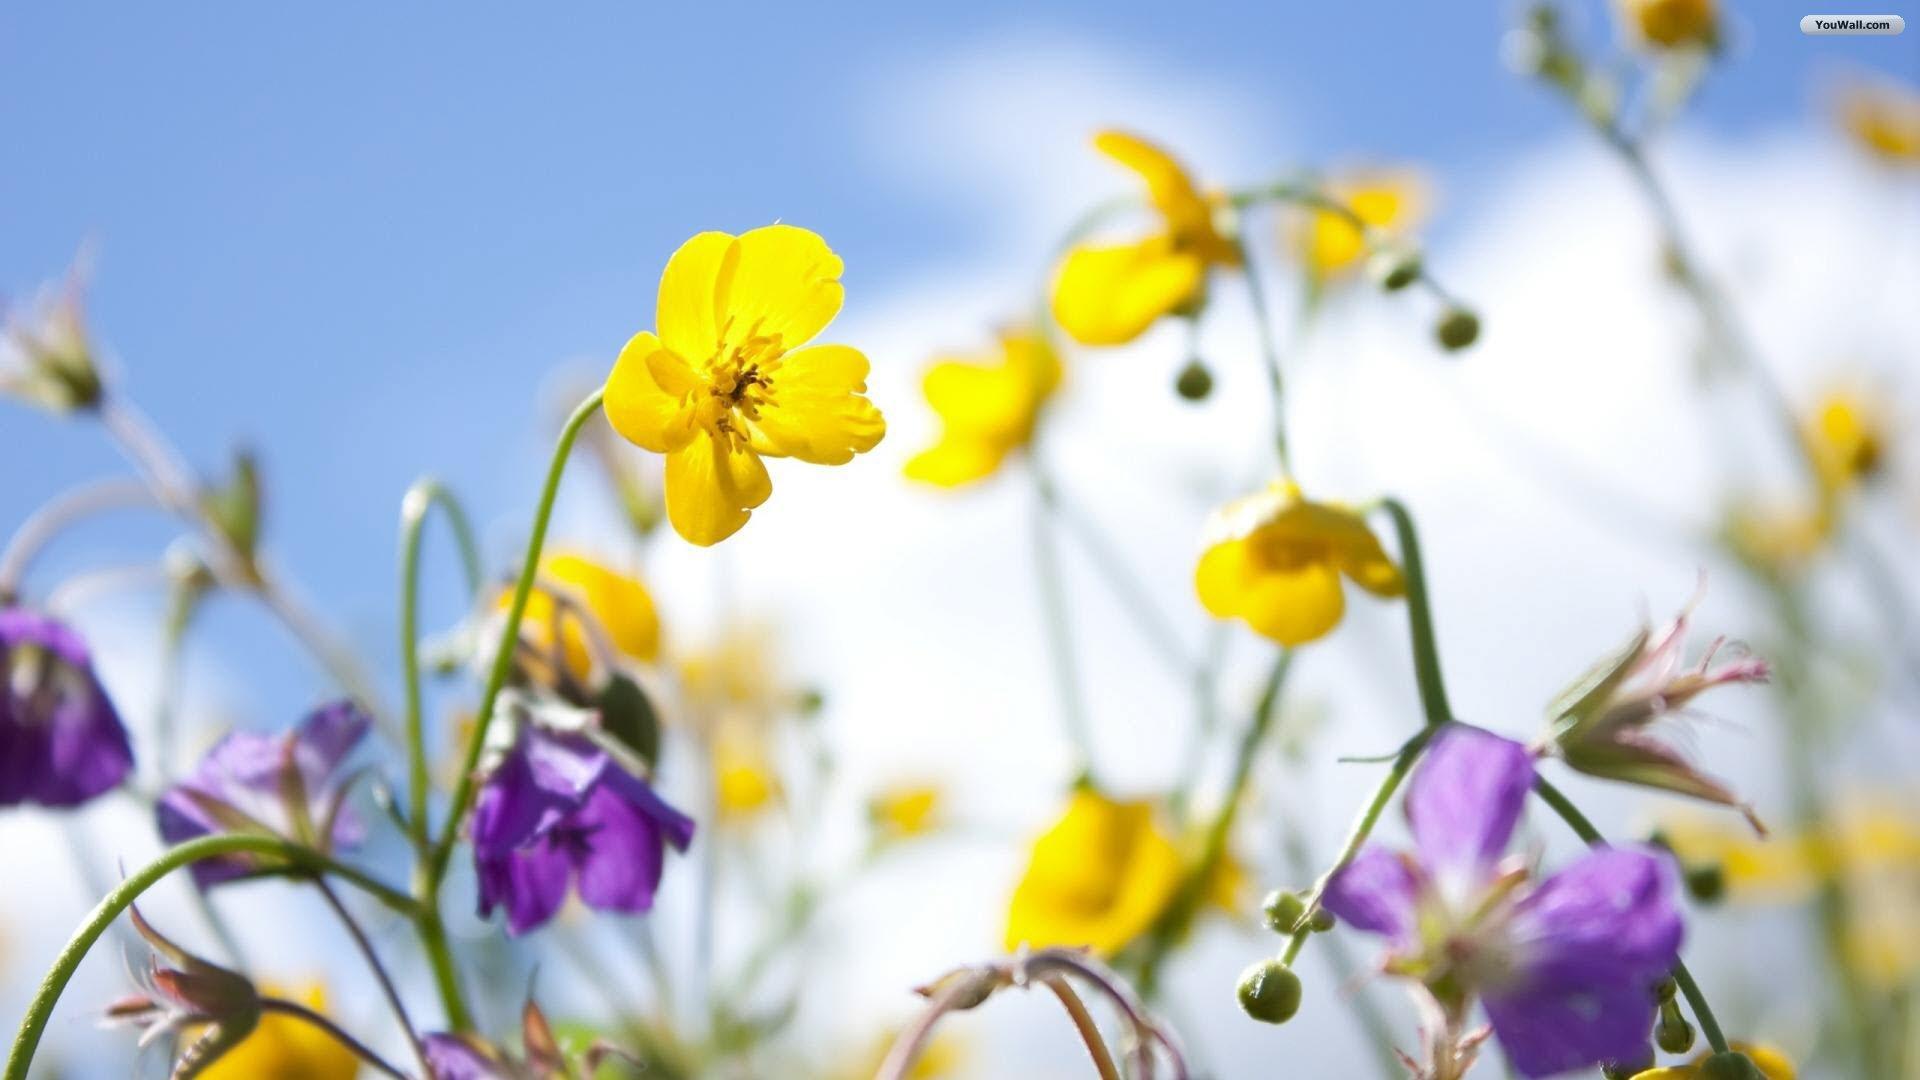 Wallpaper Spring Flowers 1920x1080